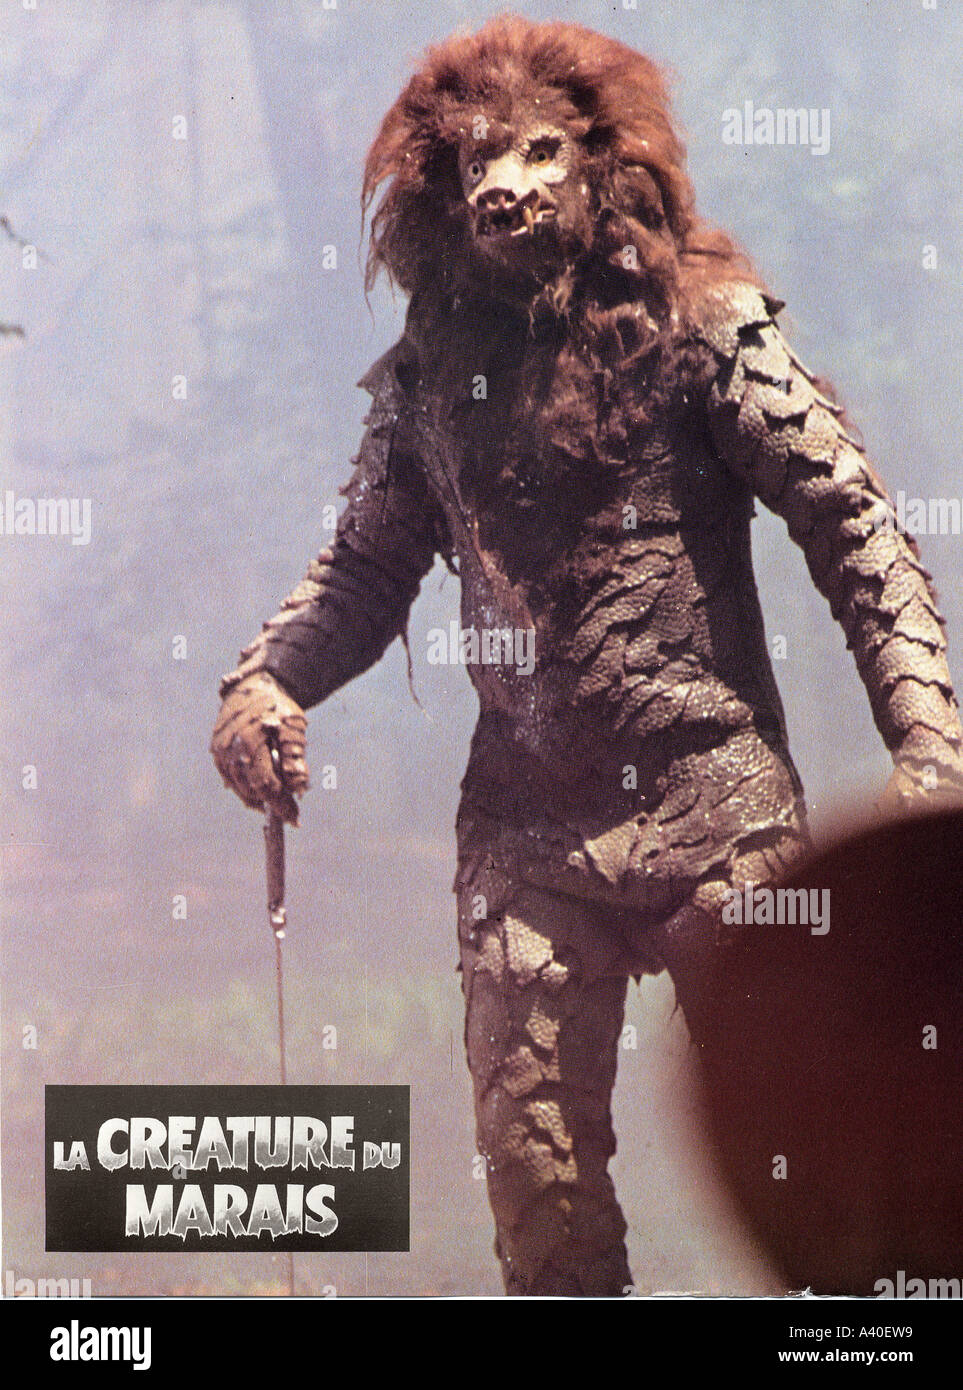 LA CREATURE DU MARAIS French horror film - Stock Image